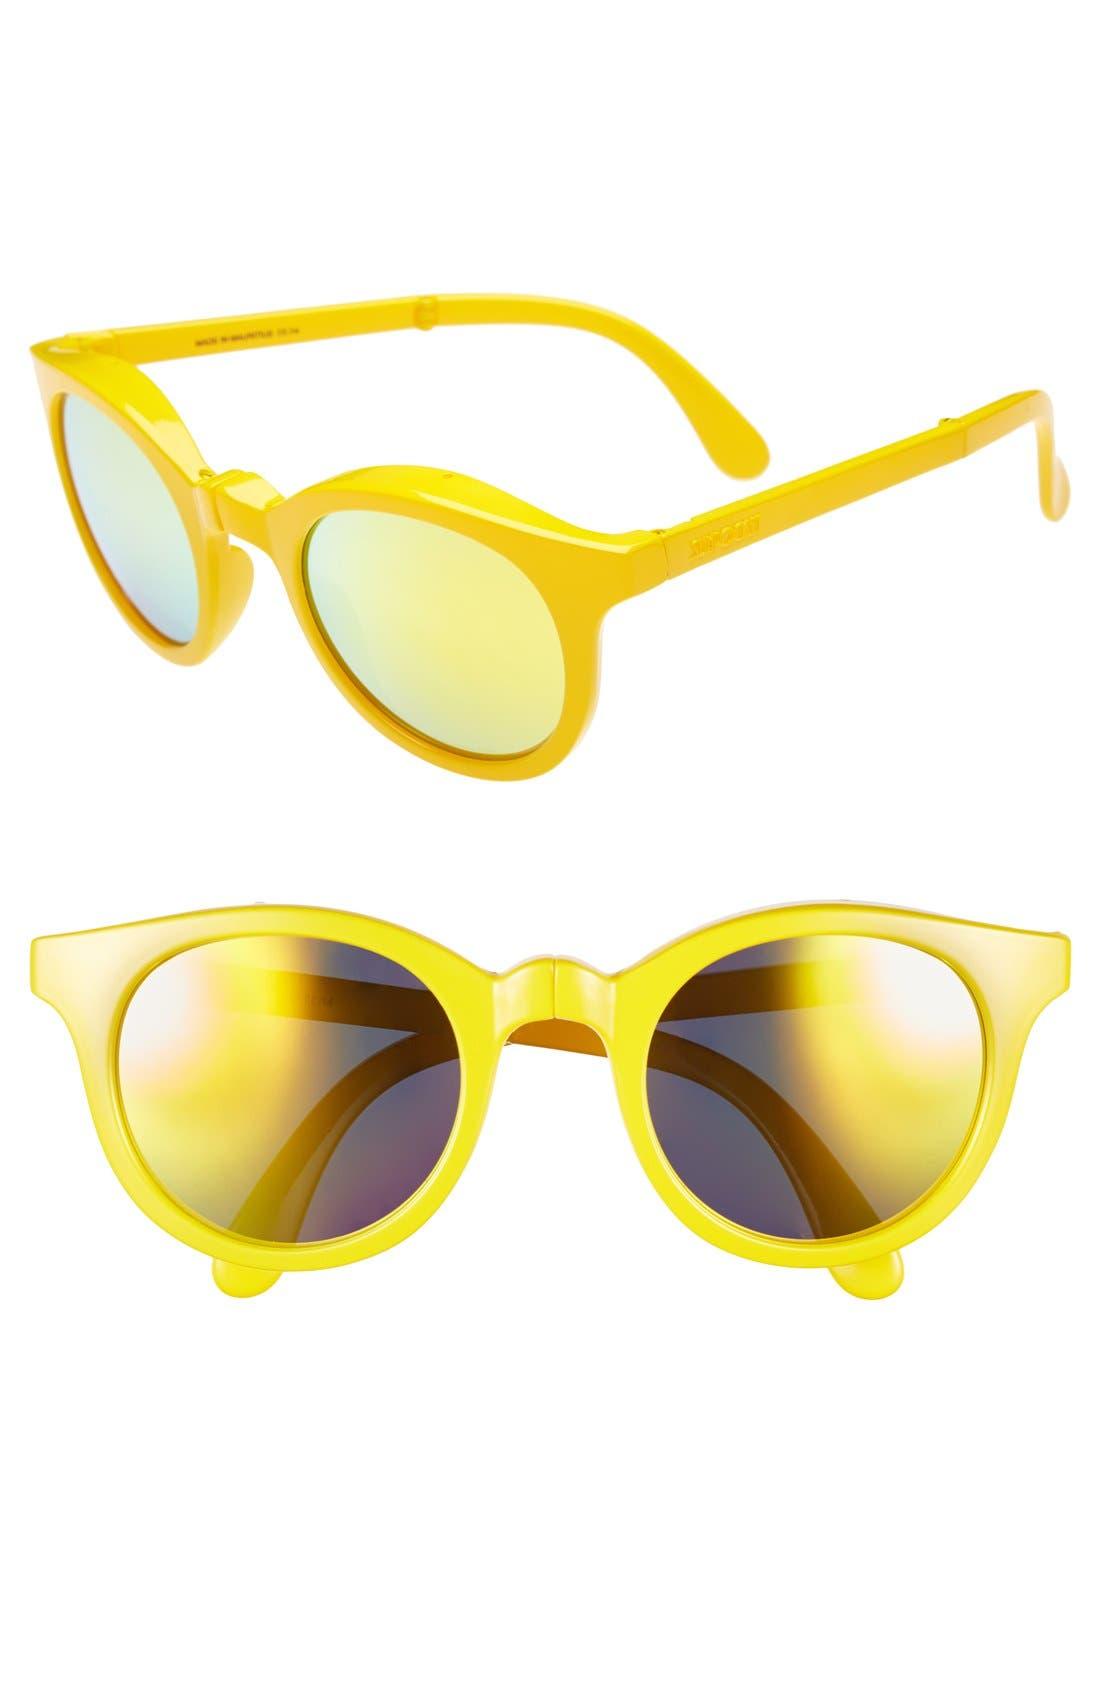 Main Image - Sunpocket 'Samoa' 50mm Foldable Sunglasses